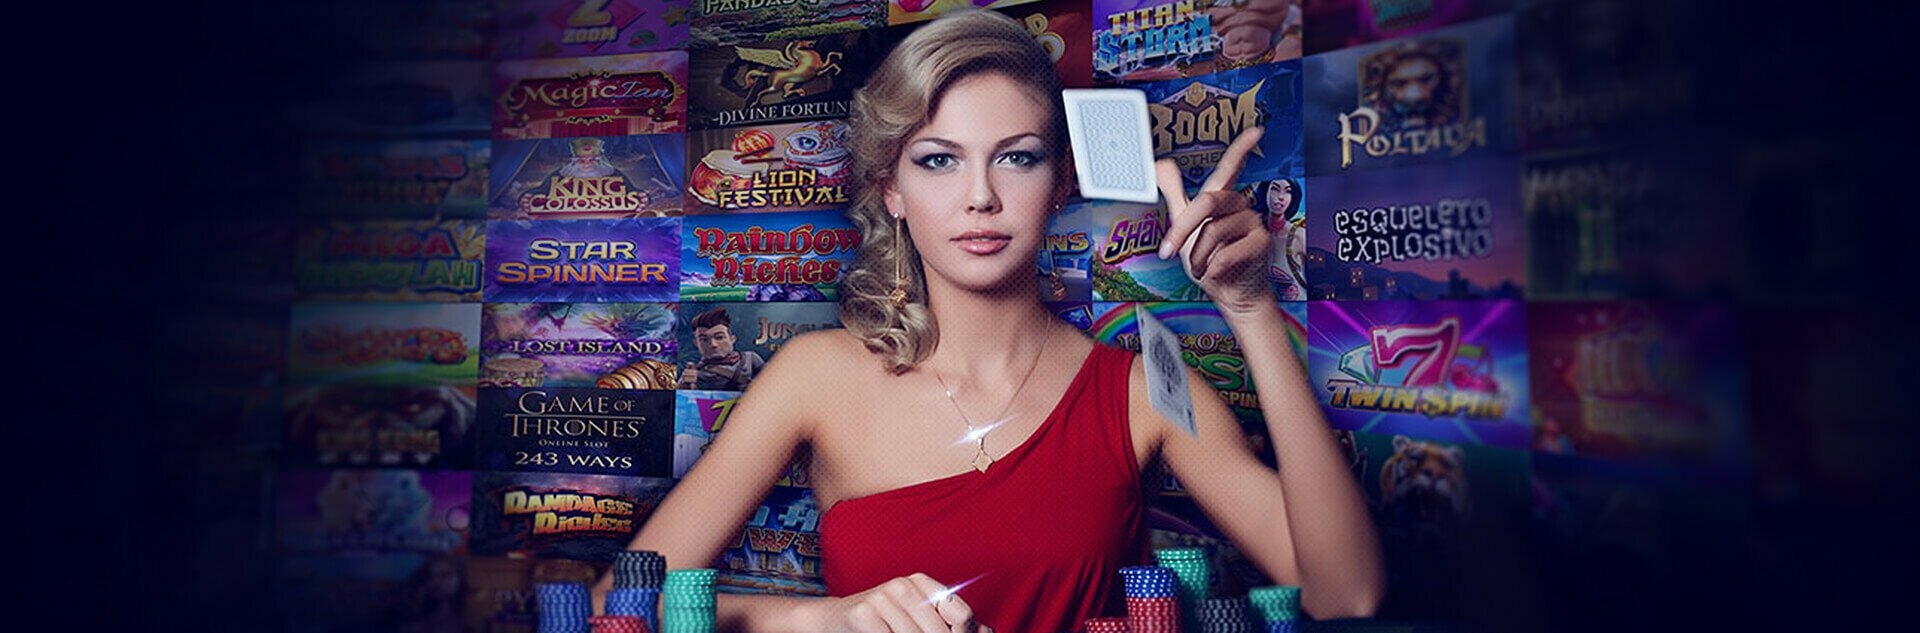 Klasino casino review UK